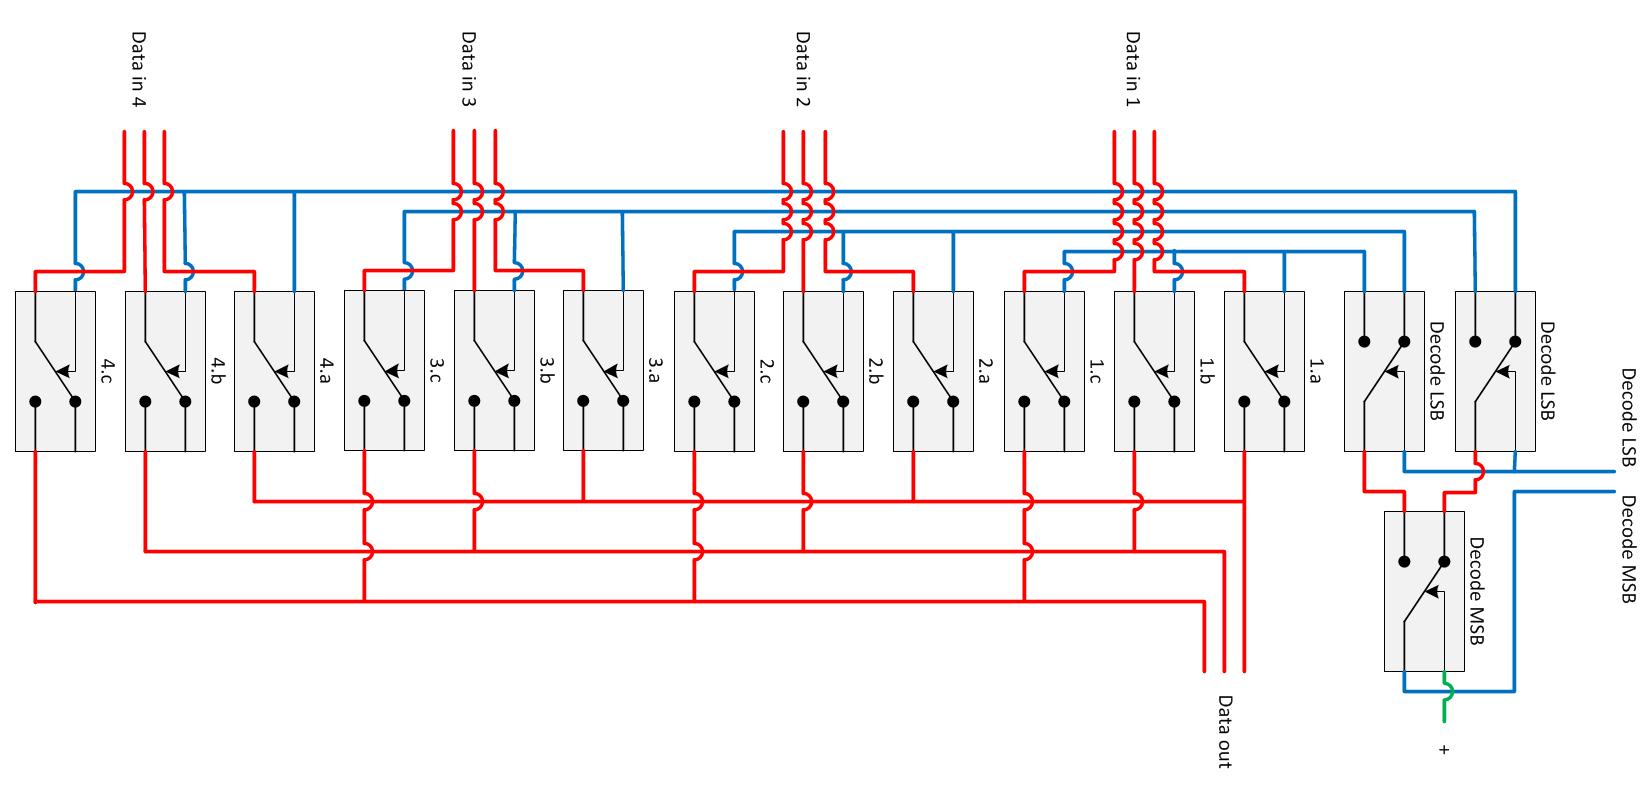 hight resolution of relay logic multiplexer relais multiplexer relay multiplexer